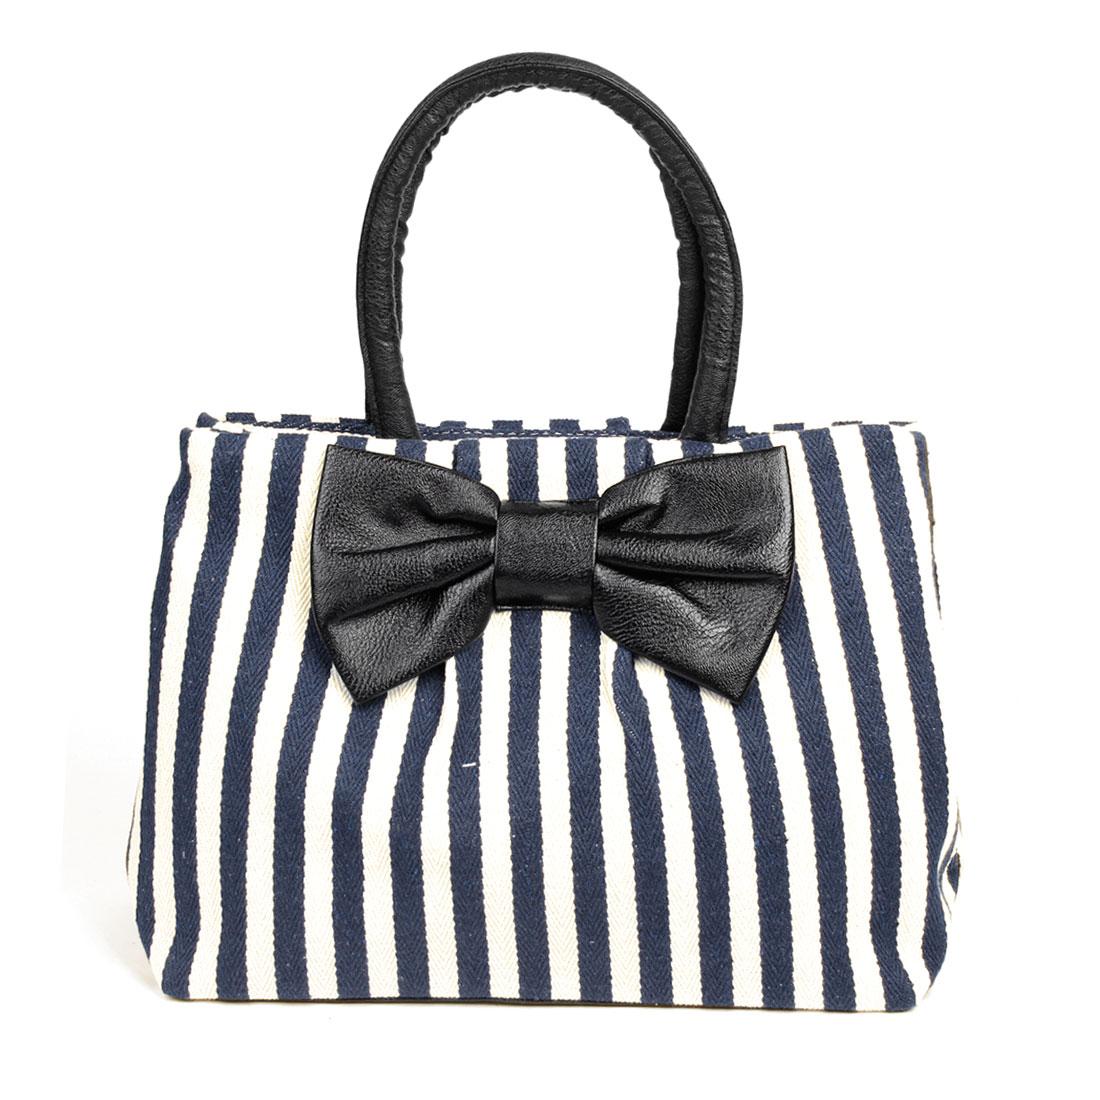 Strip Print Zipped Up Dark Brown Bowknot Decor Handbag Tote Bag for Ladies